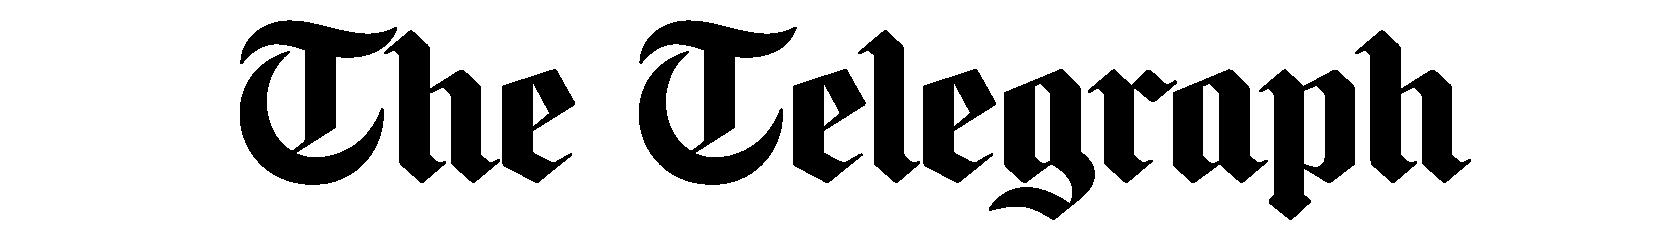 Press logos-01 copy_2.png